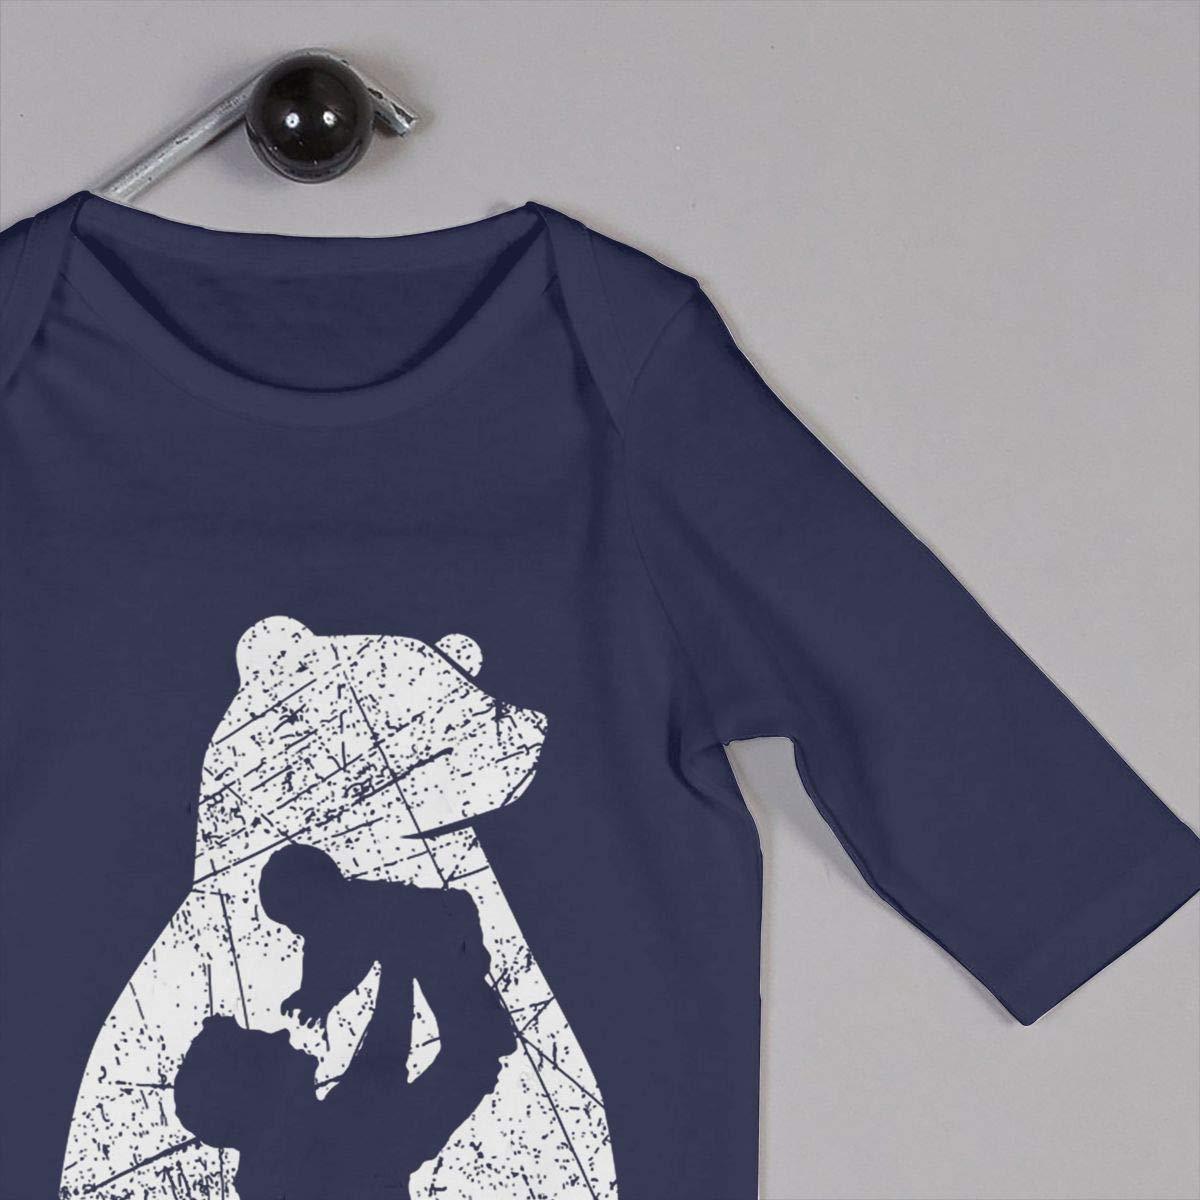 VEKDONE Baby Little Boys Dinosaur Sweatshirt Long Sleeve Cartoon Printed T-Shirt Little Kids Spring Fall Pullover Tops